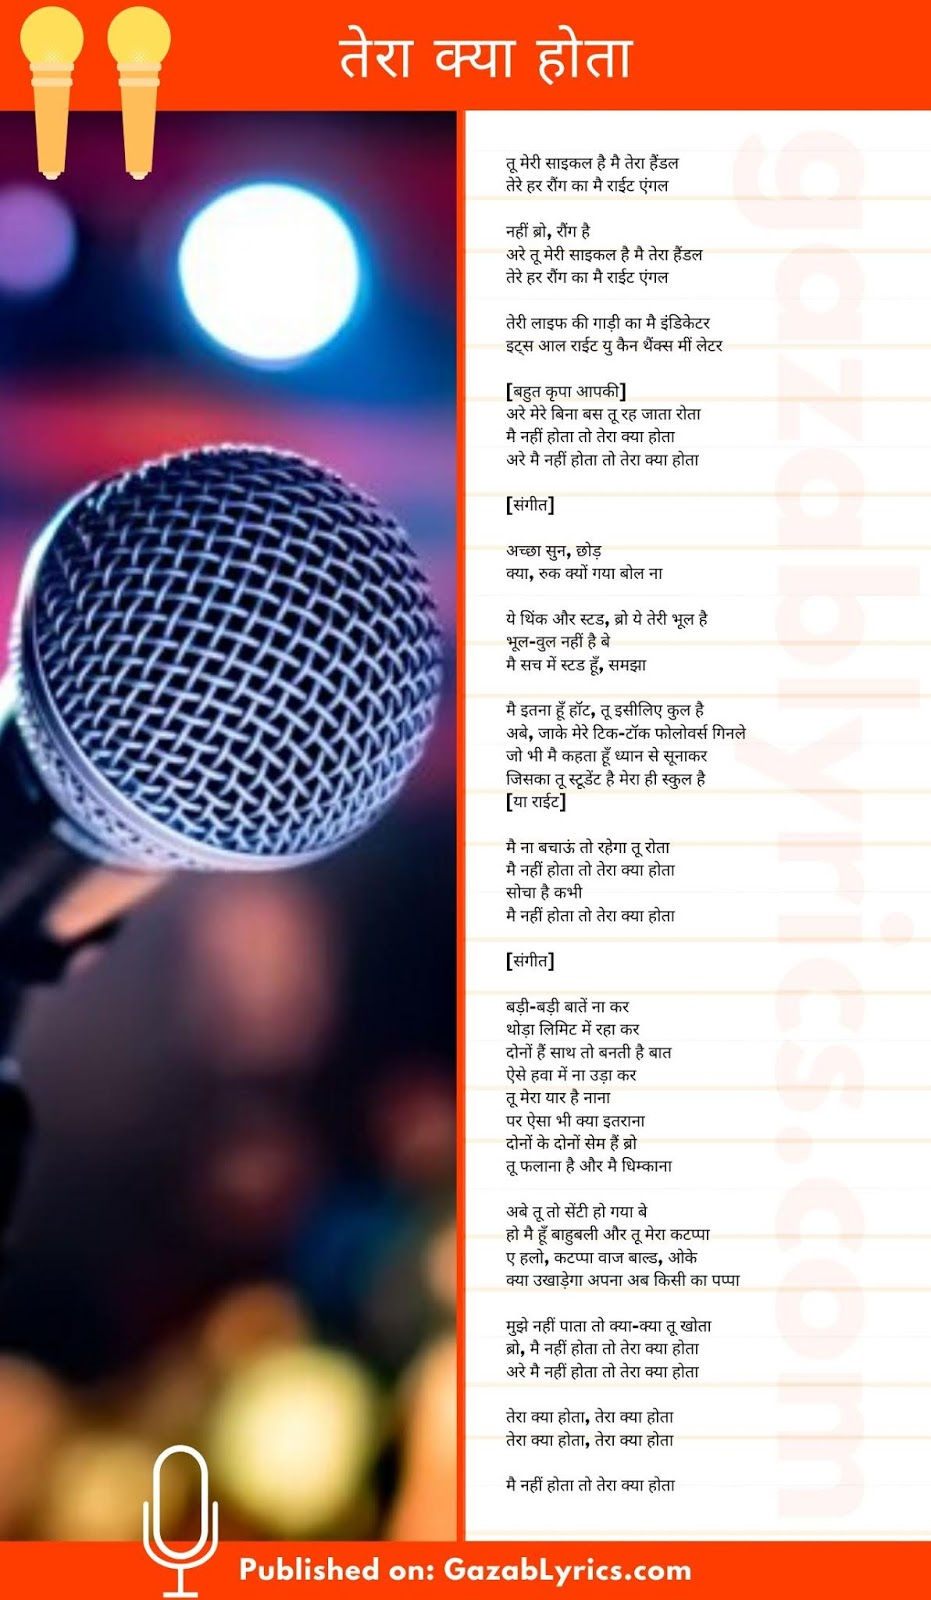 Tera Kya Hota song lyrics image